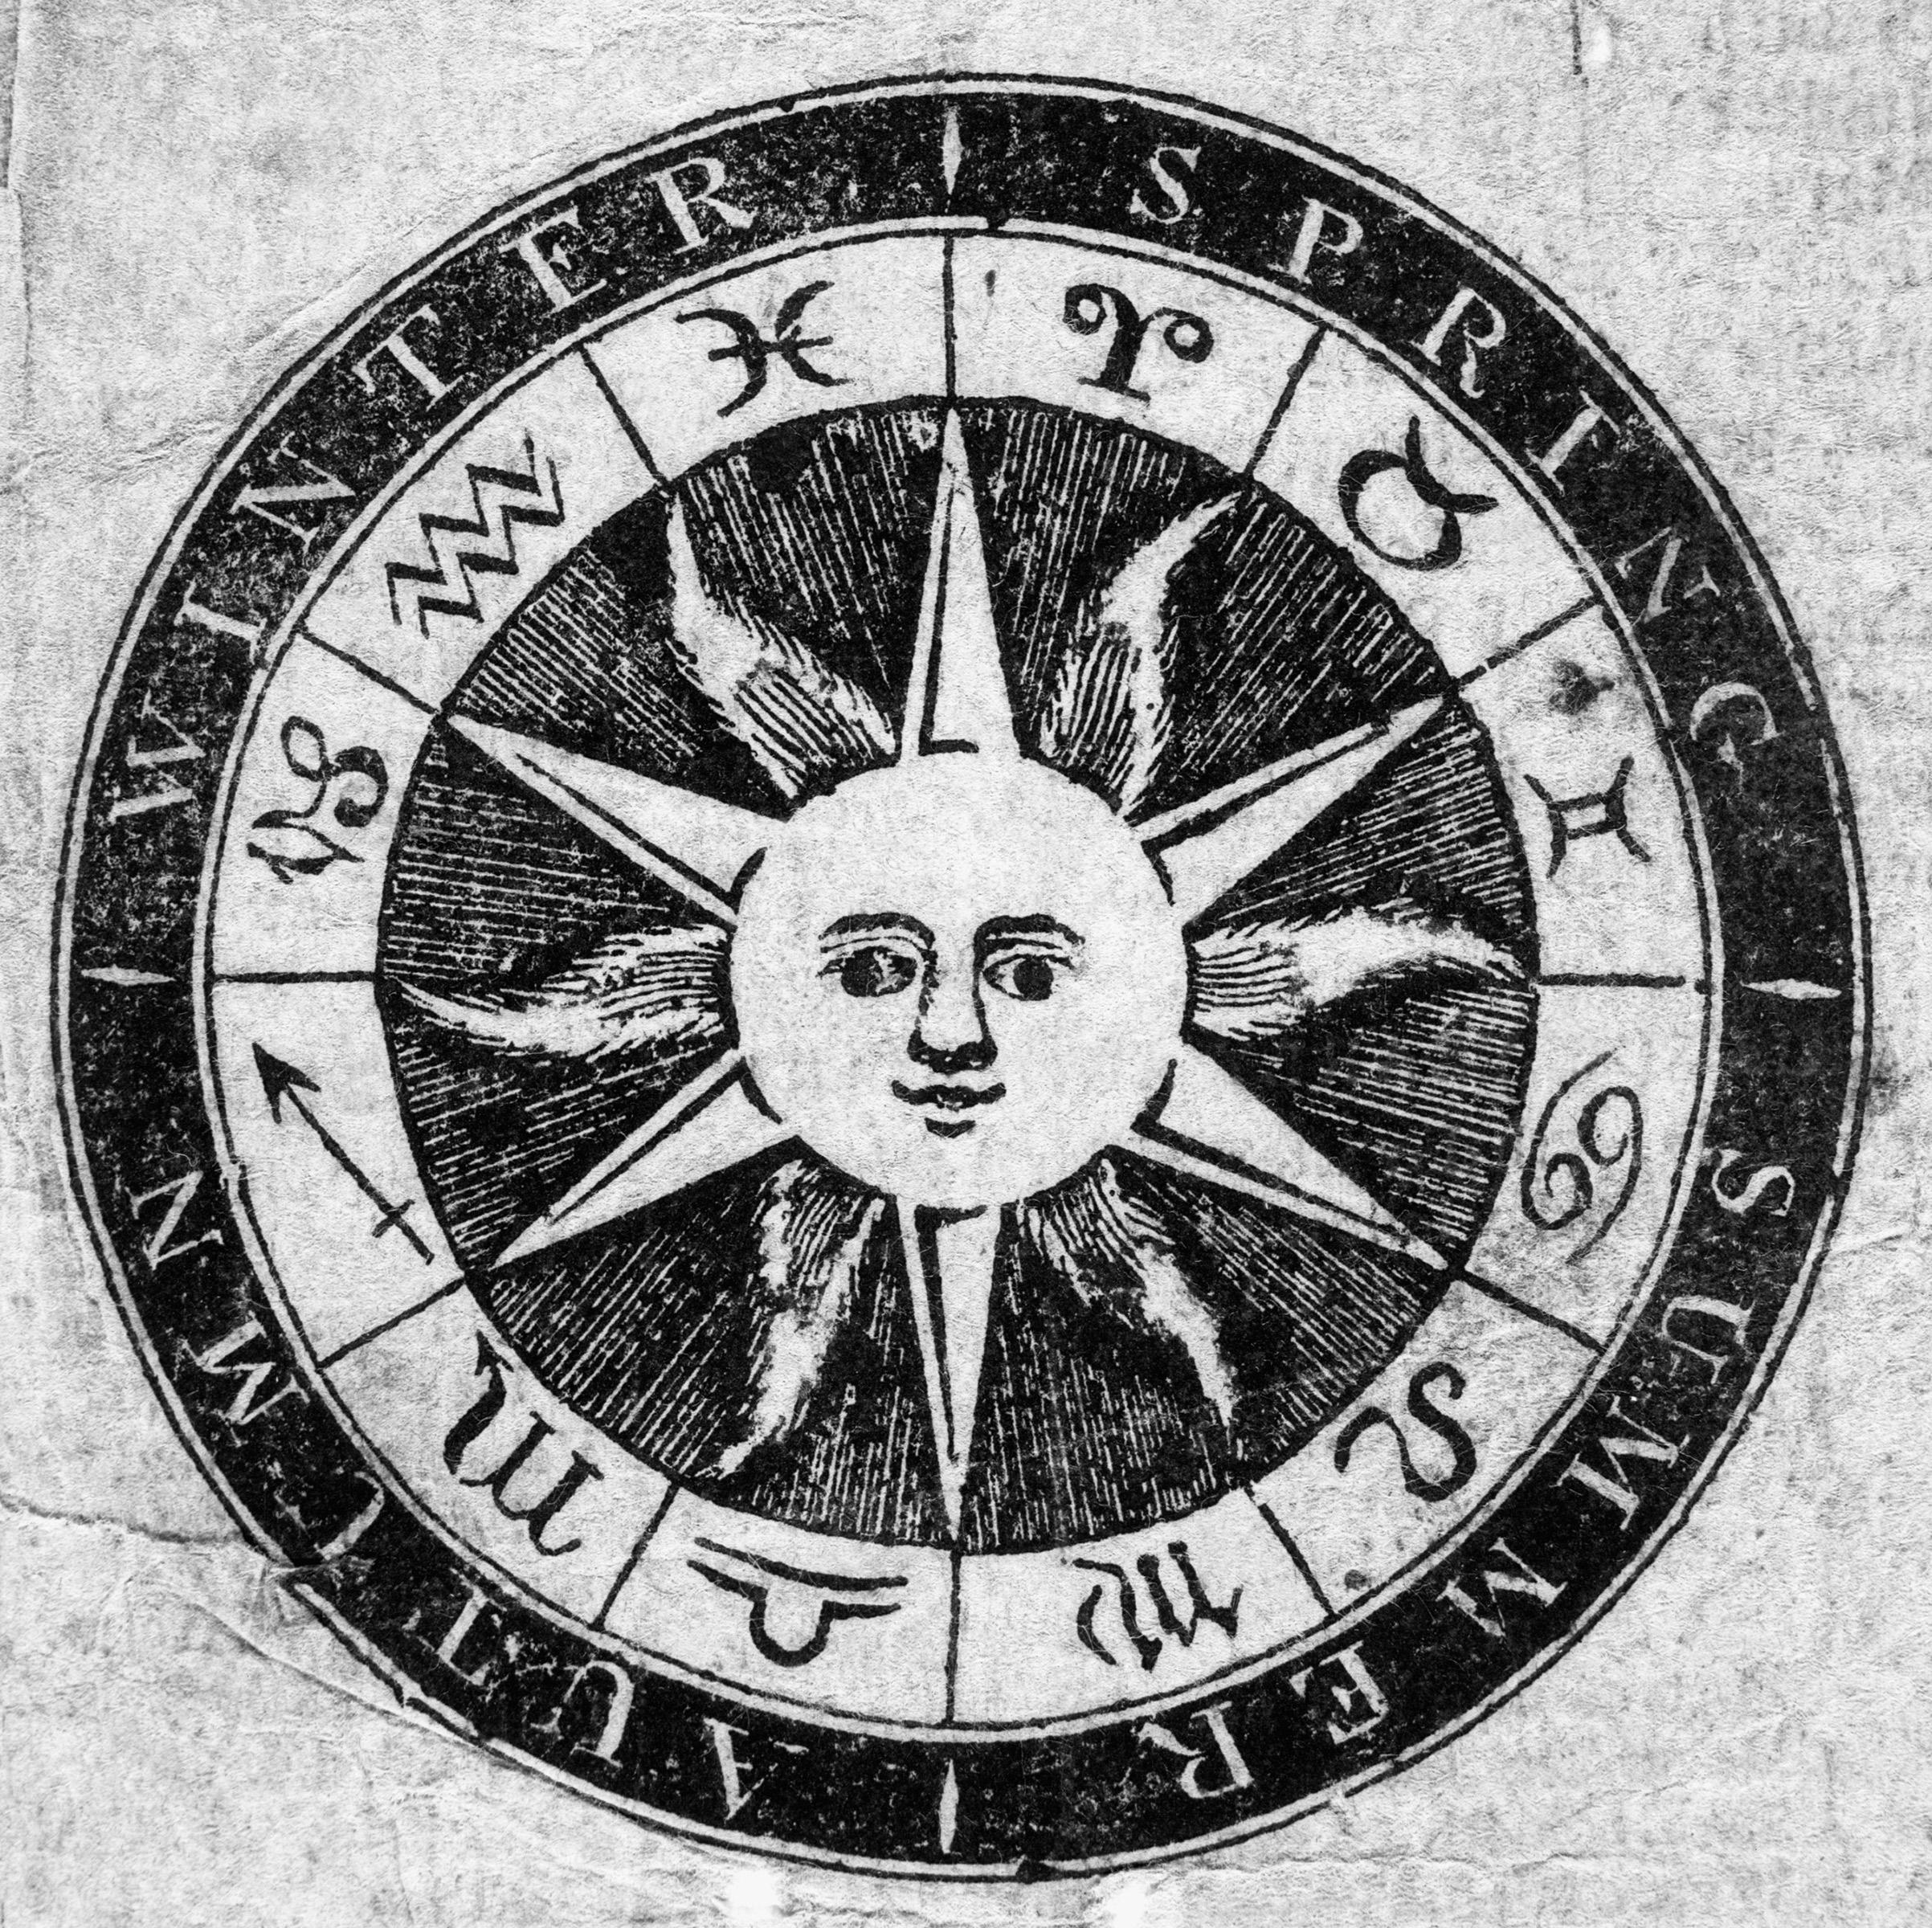 zodiac-history-astrology-signs.jpg